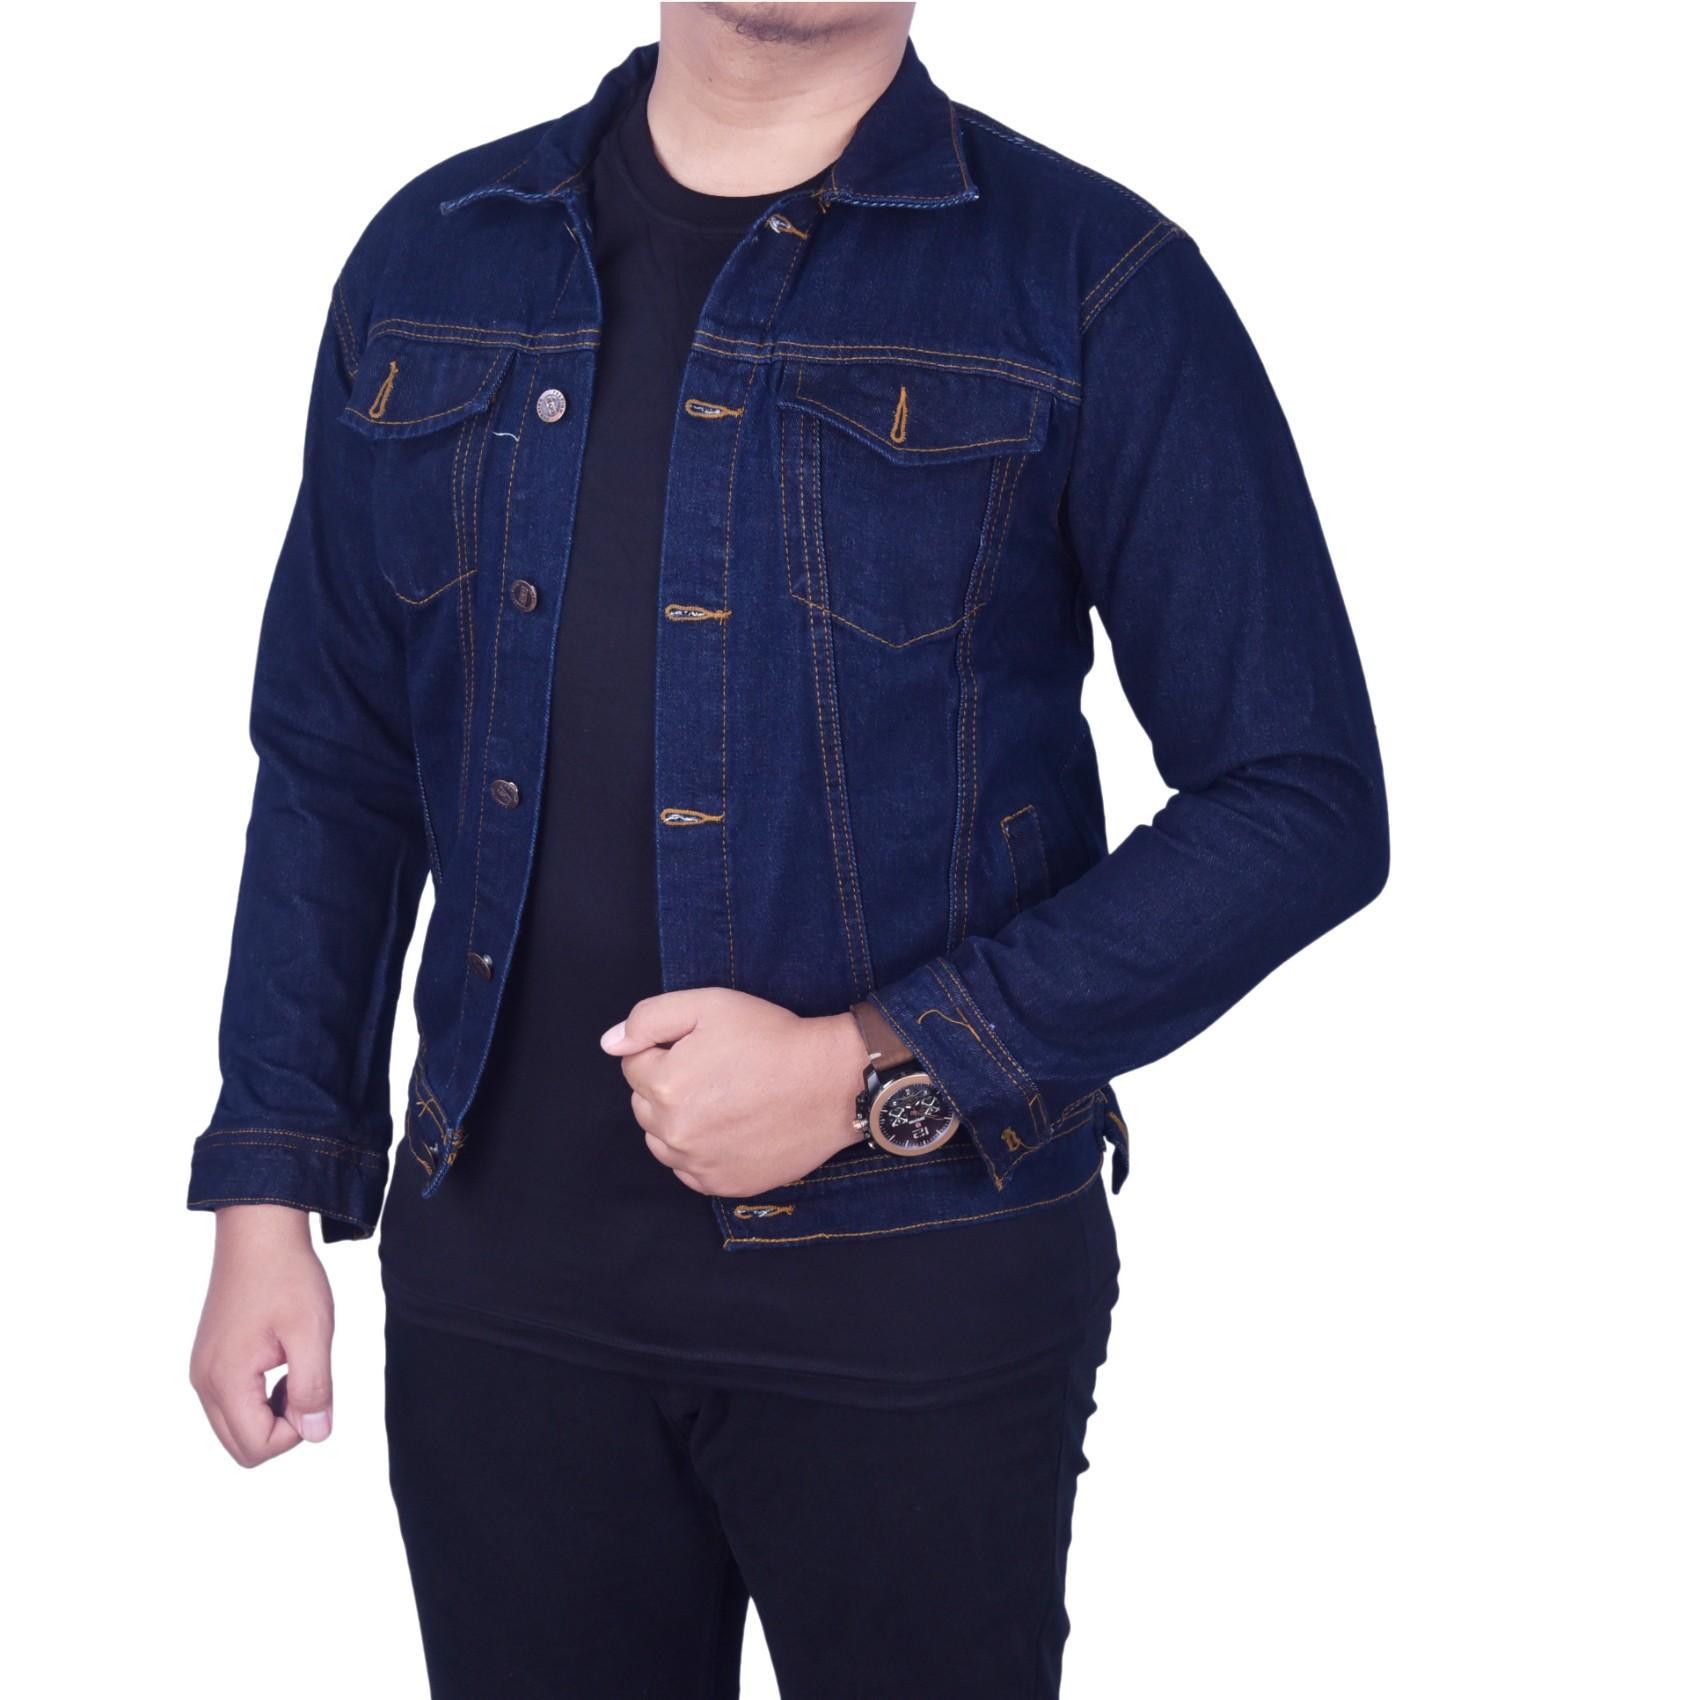 Fitur Dgm Fashion1 Jaket Jeans Denim Garmen Polos Combinasi Pria Parasut Bomber